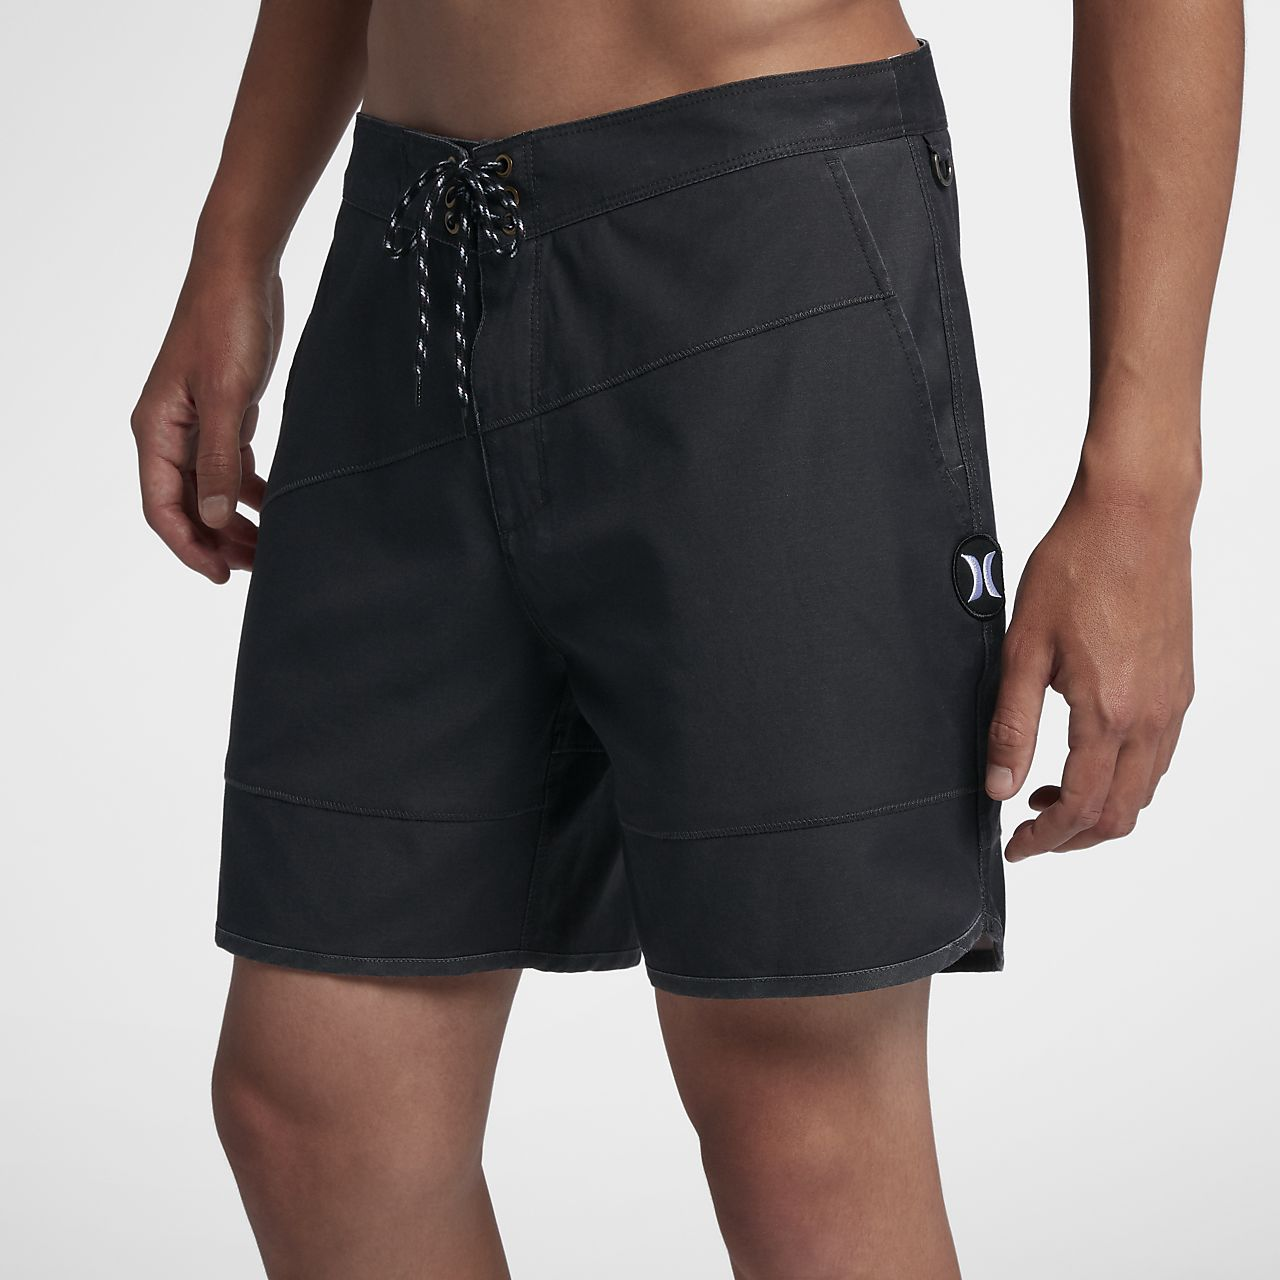 "Hurley Beachside Nautical Men's 17"" Board Shorts"